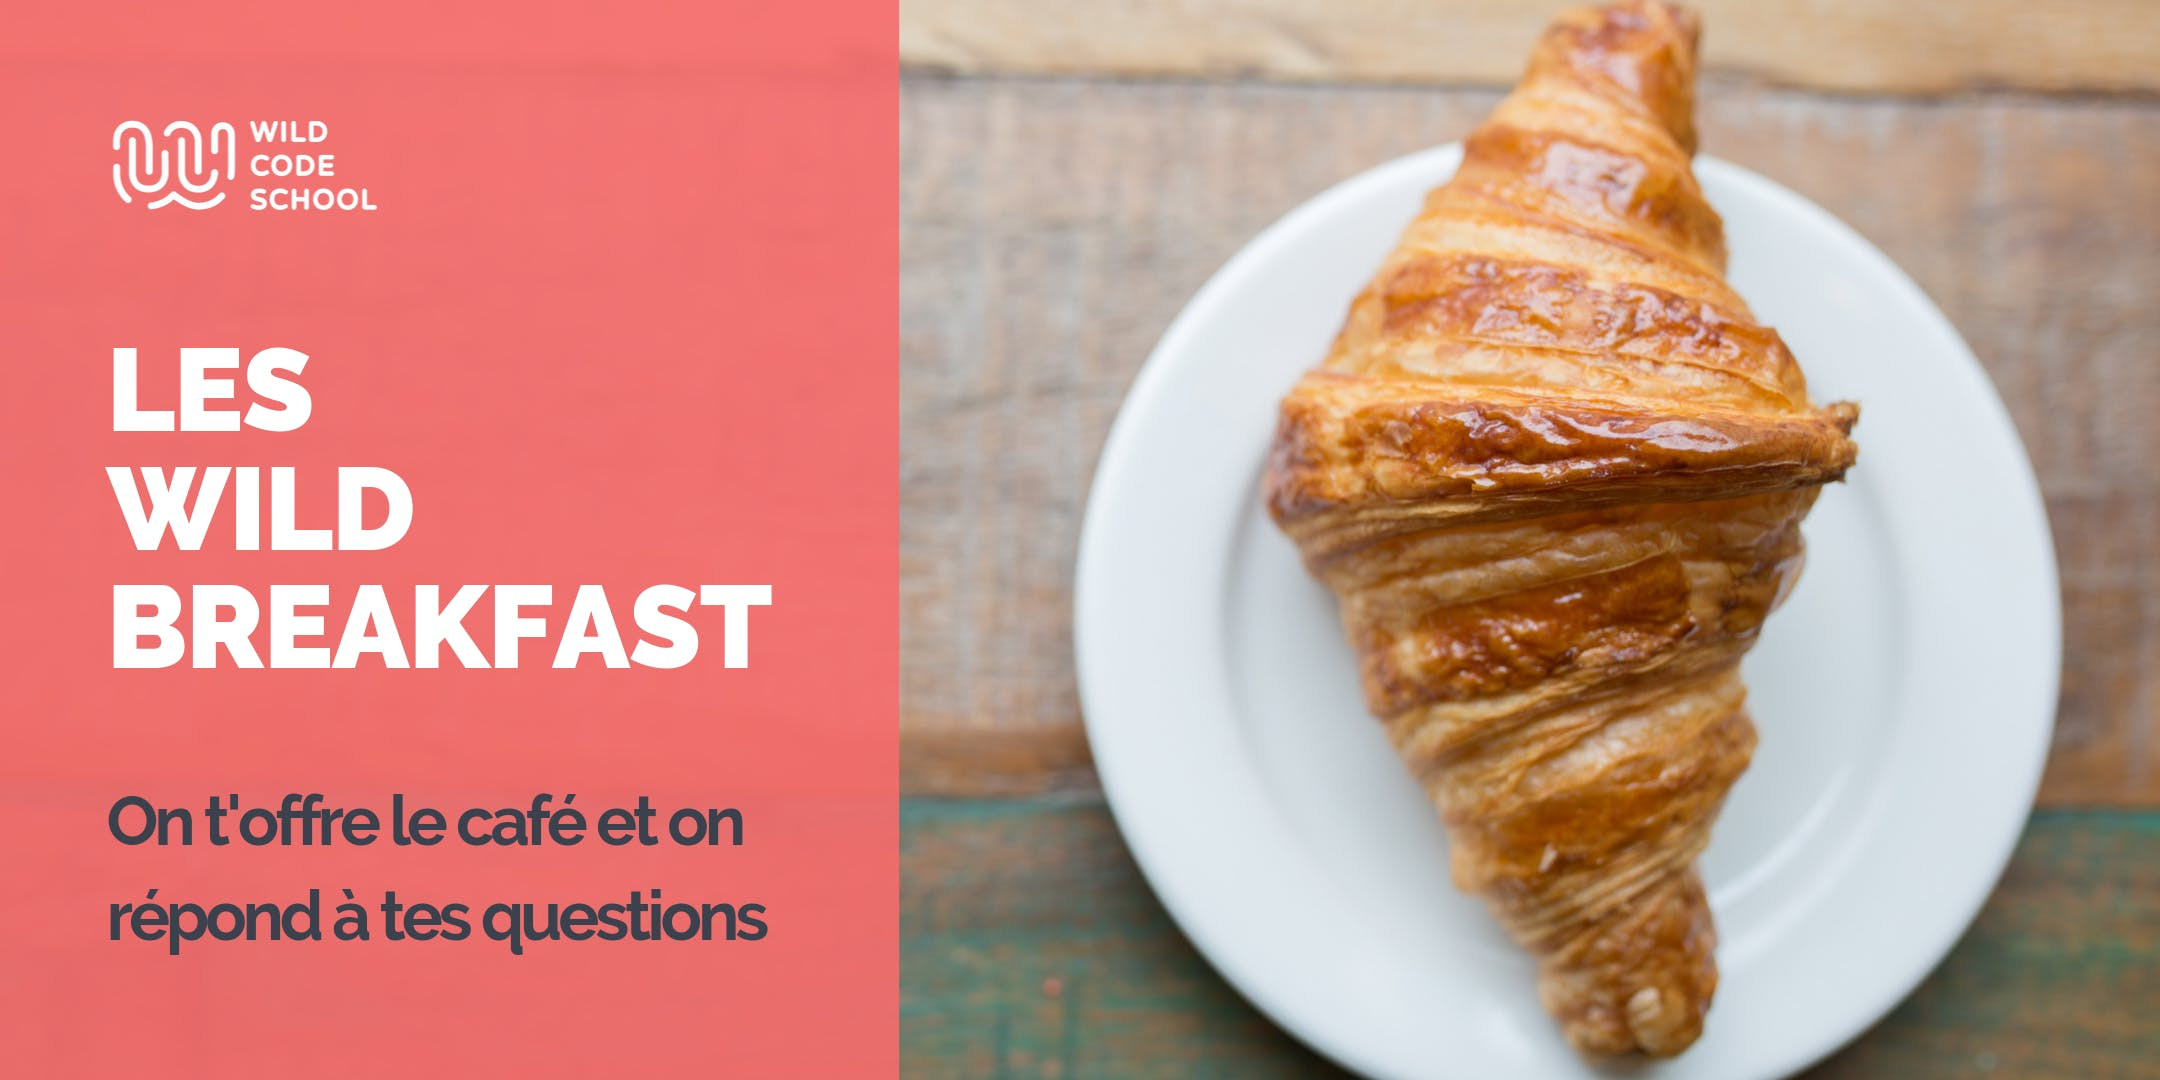 Wild Breakfast - Présentation Ecole & Formations - Wild Code School Tours